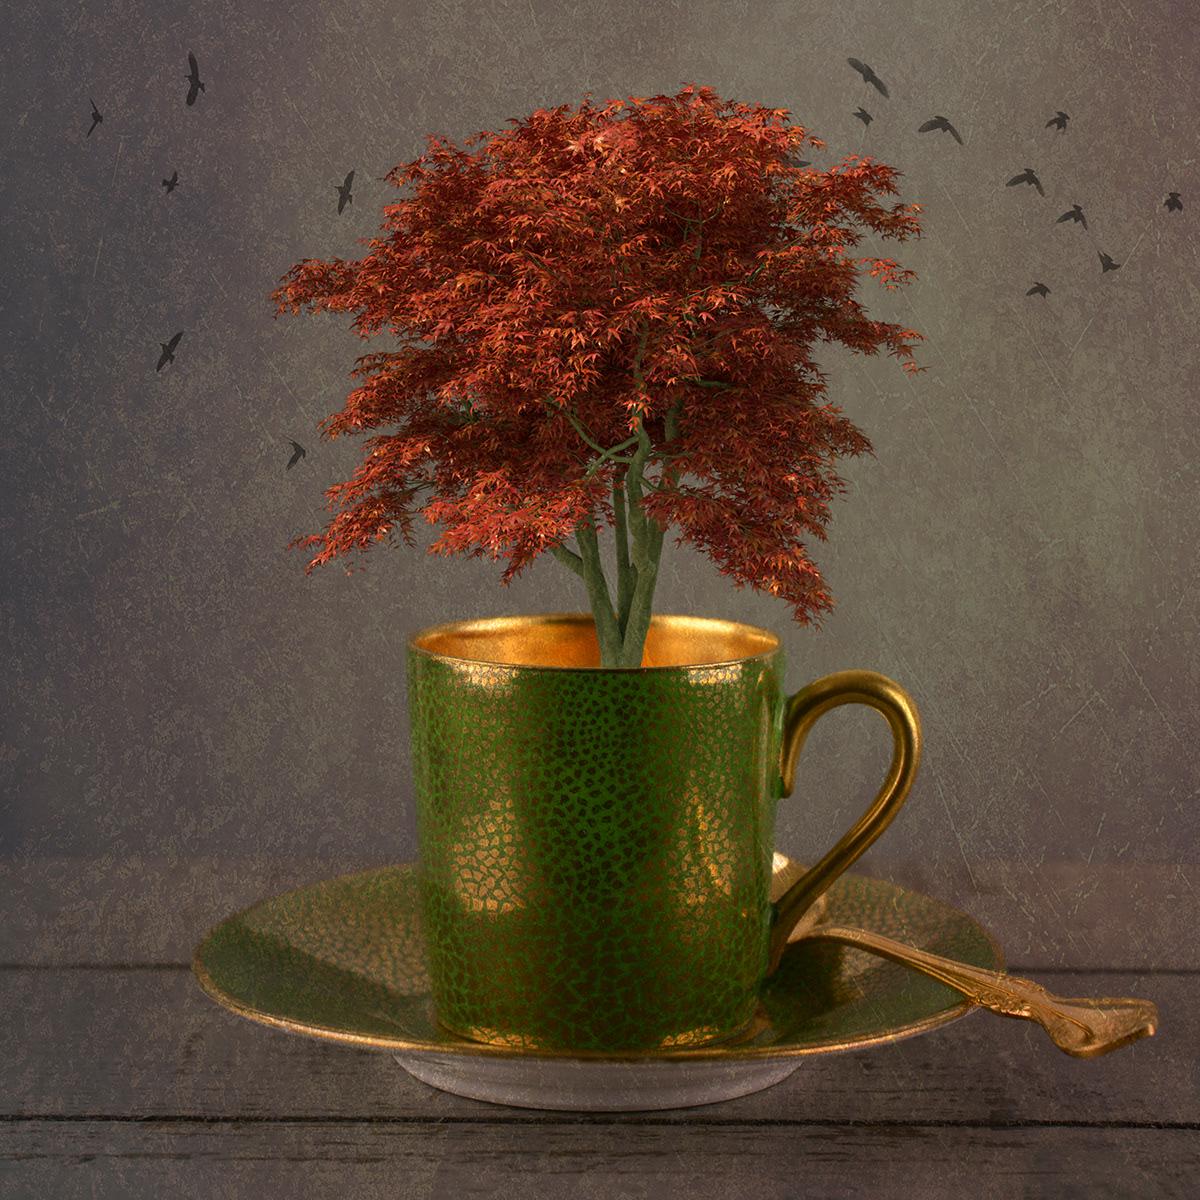 Cups and Mugs / фотограф Bettina Güber